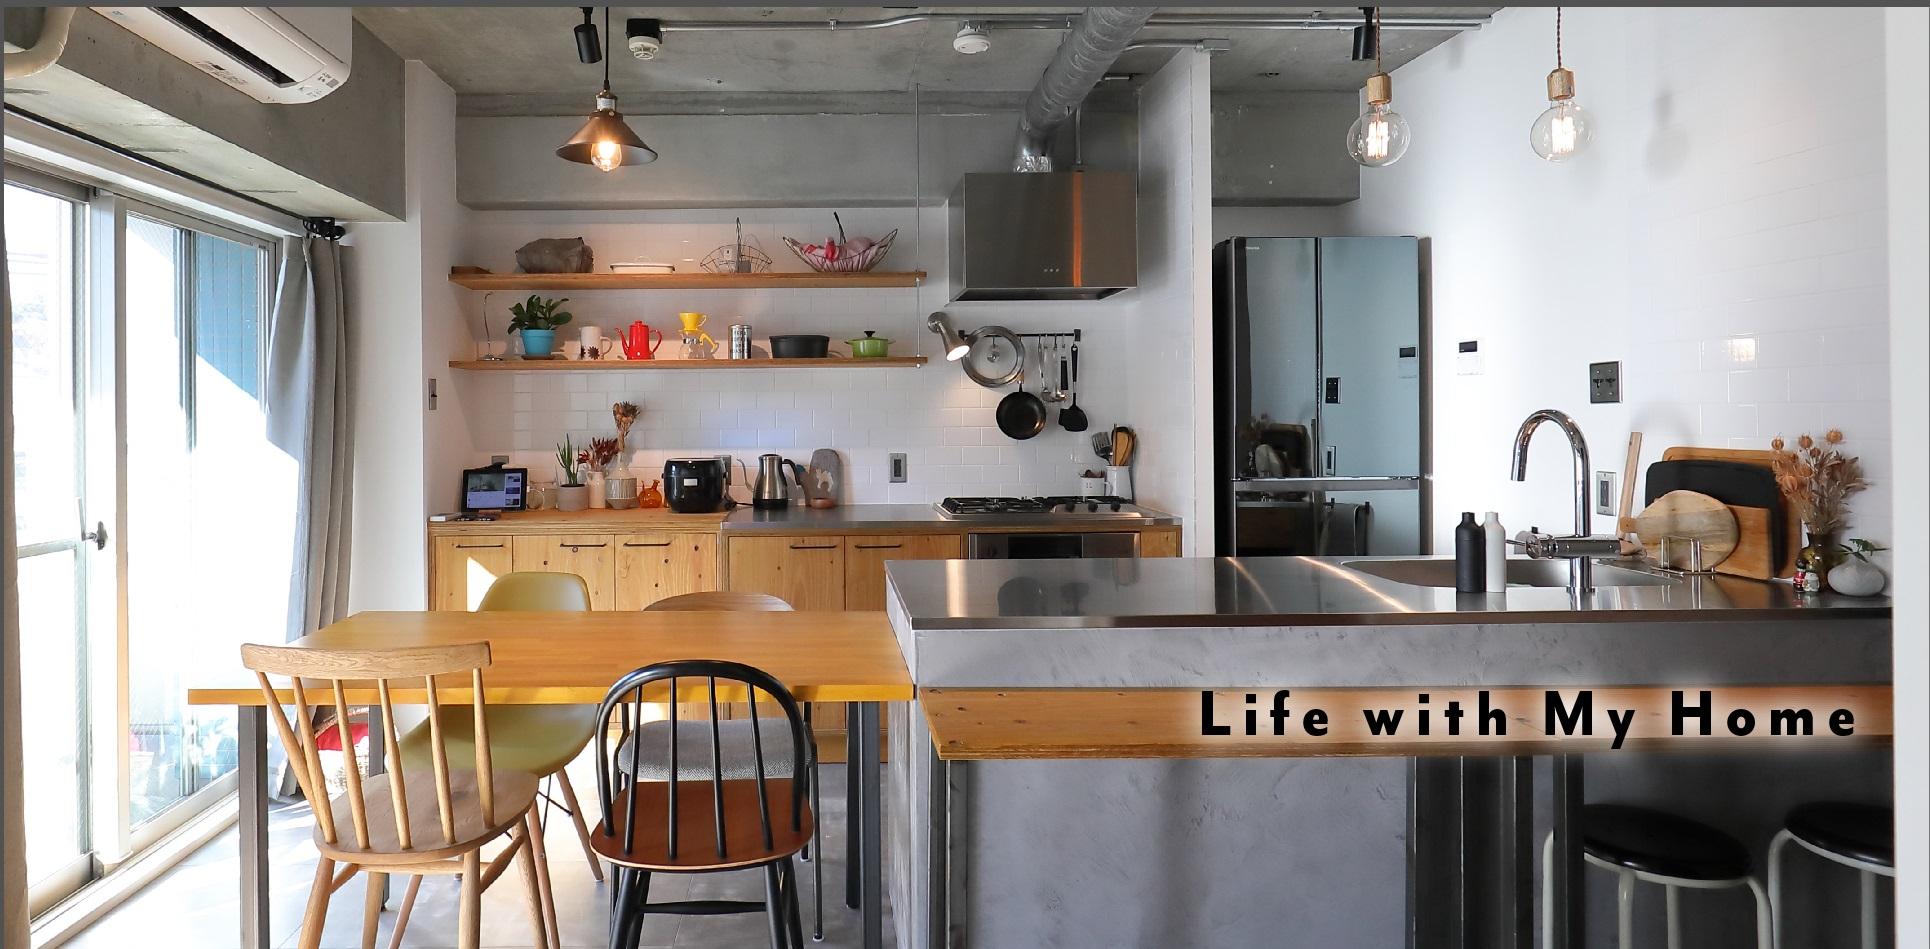 Life with My Home|居心地のいい家が、生活の基盤。